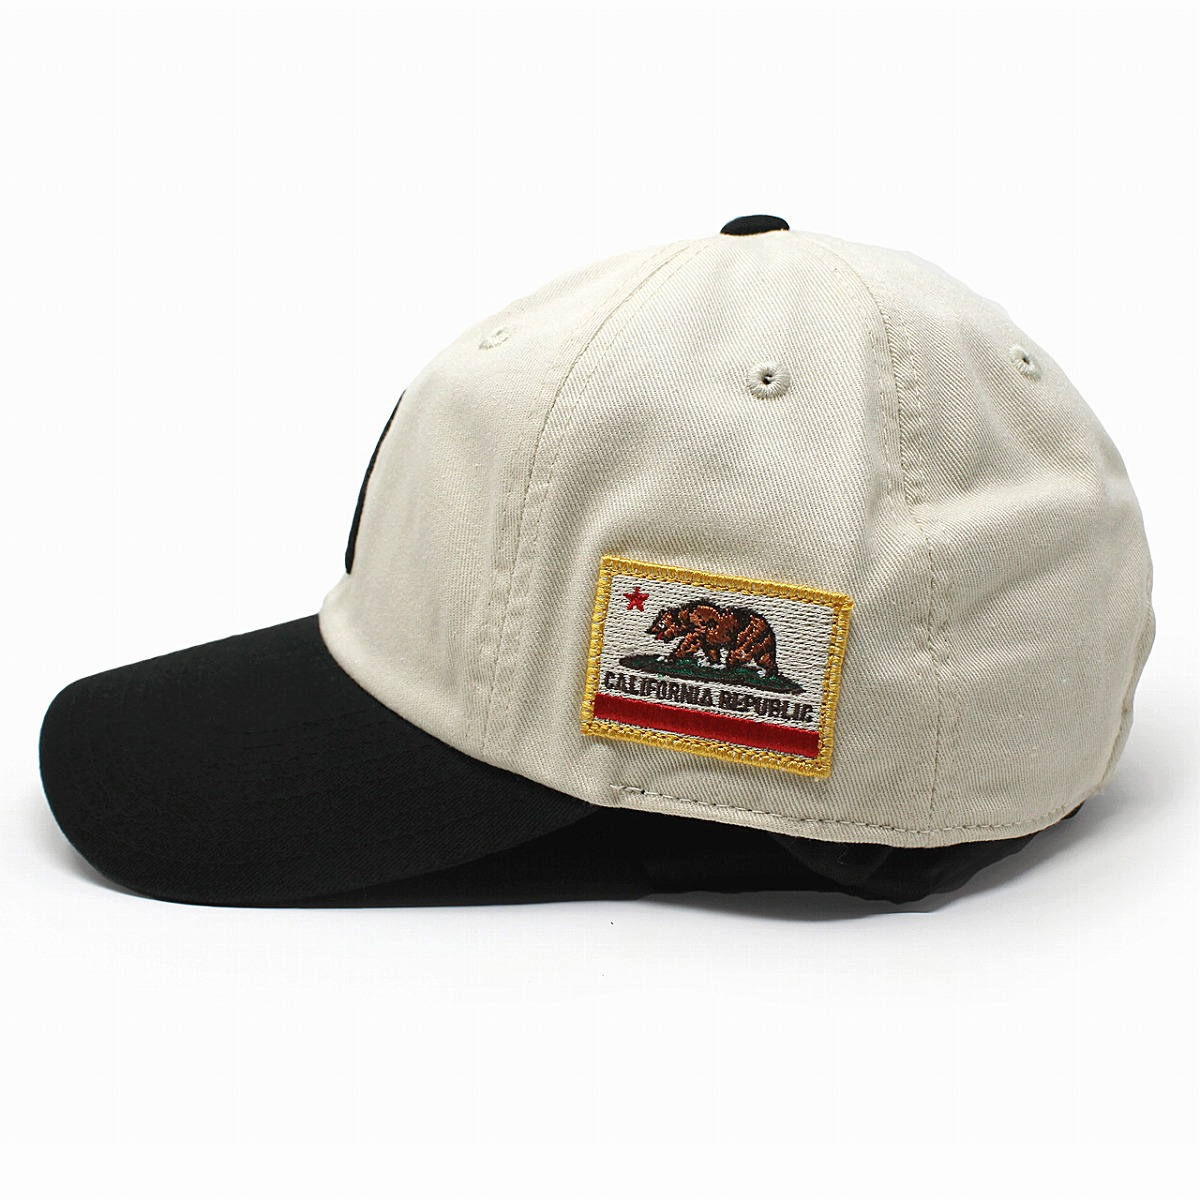 75af6b9c4f0810 ... American Needle cap men American casual fashion LA logo Lady's hat Los  Angels oar season BB ...